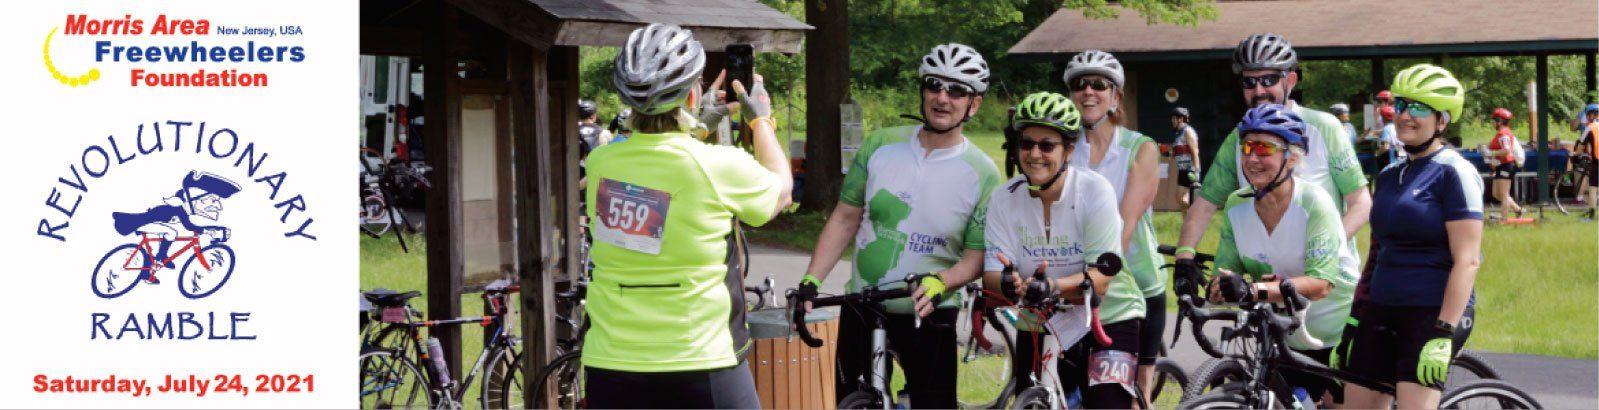 Revolutionary Ramble Bicycle Tour